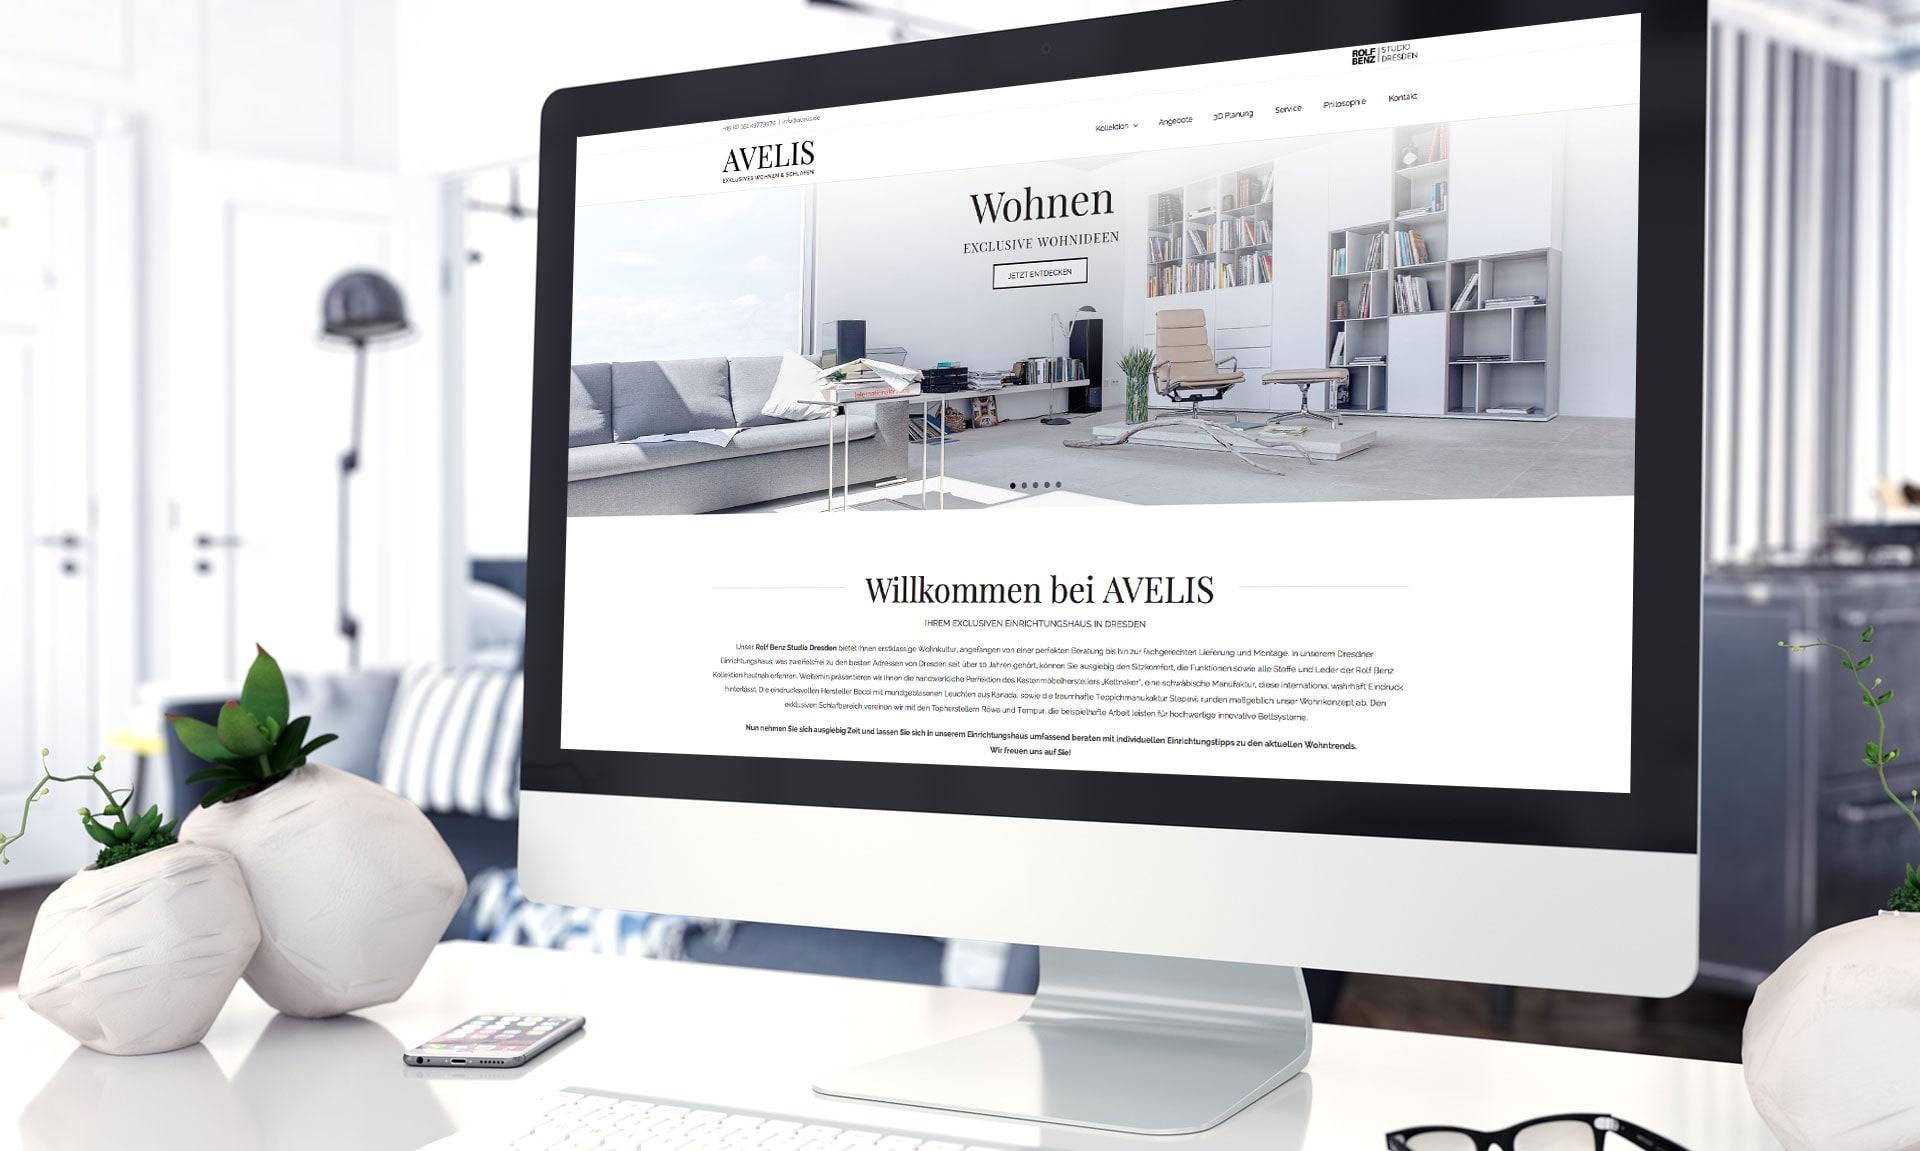 Avelis - Referenz Maho Werbeagentur Dresden